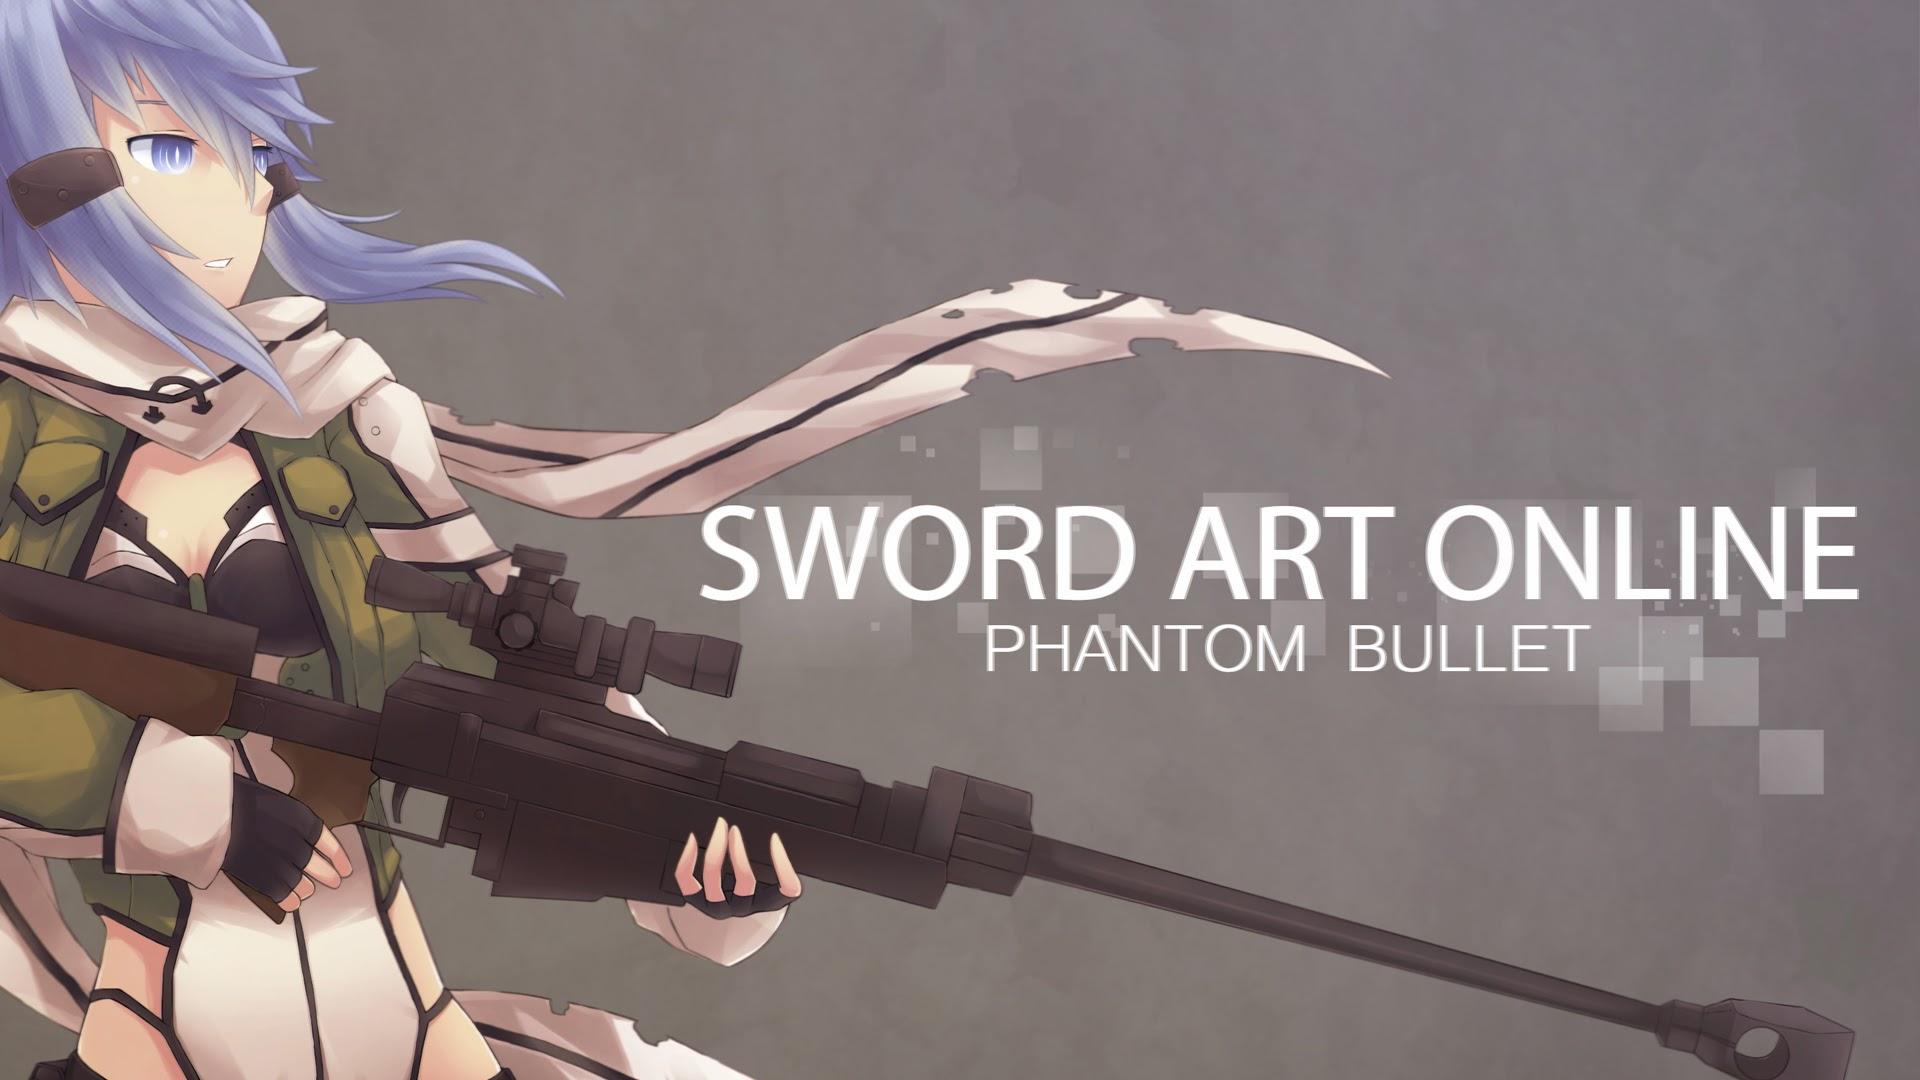 sinon sword art online 2 phantom bullet gun gale online anime 2014 SAO 1920x1080